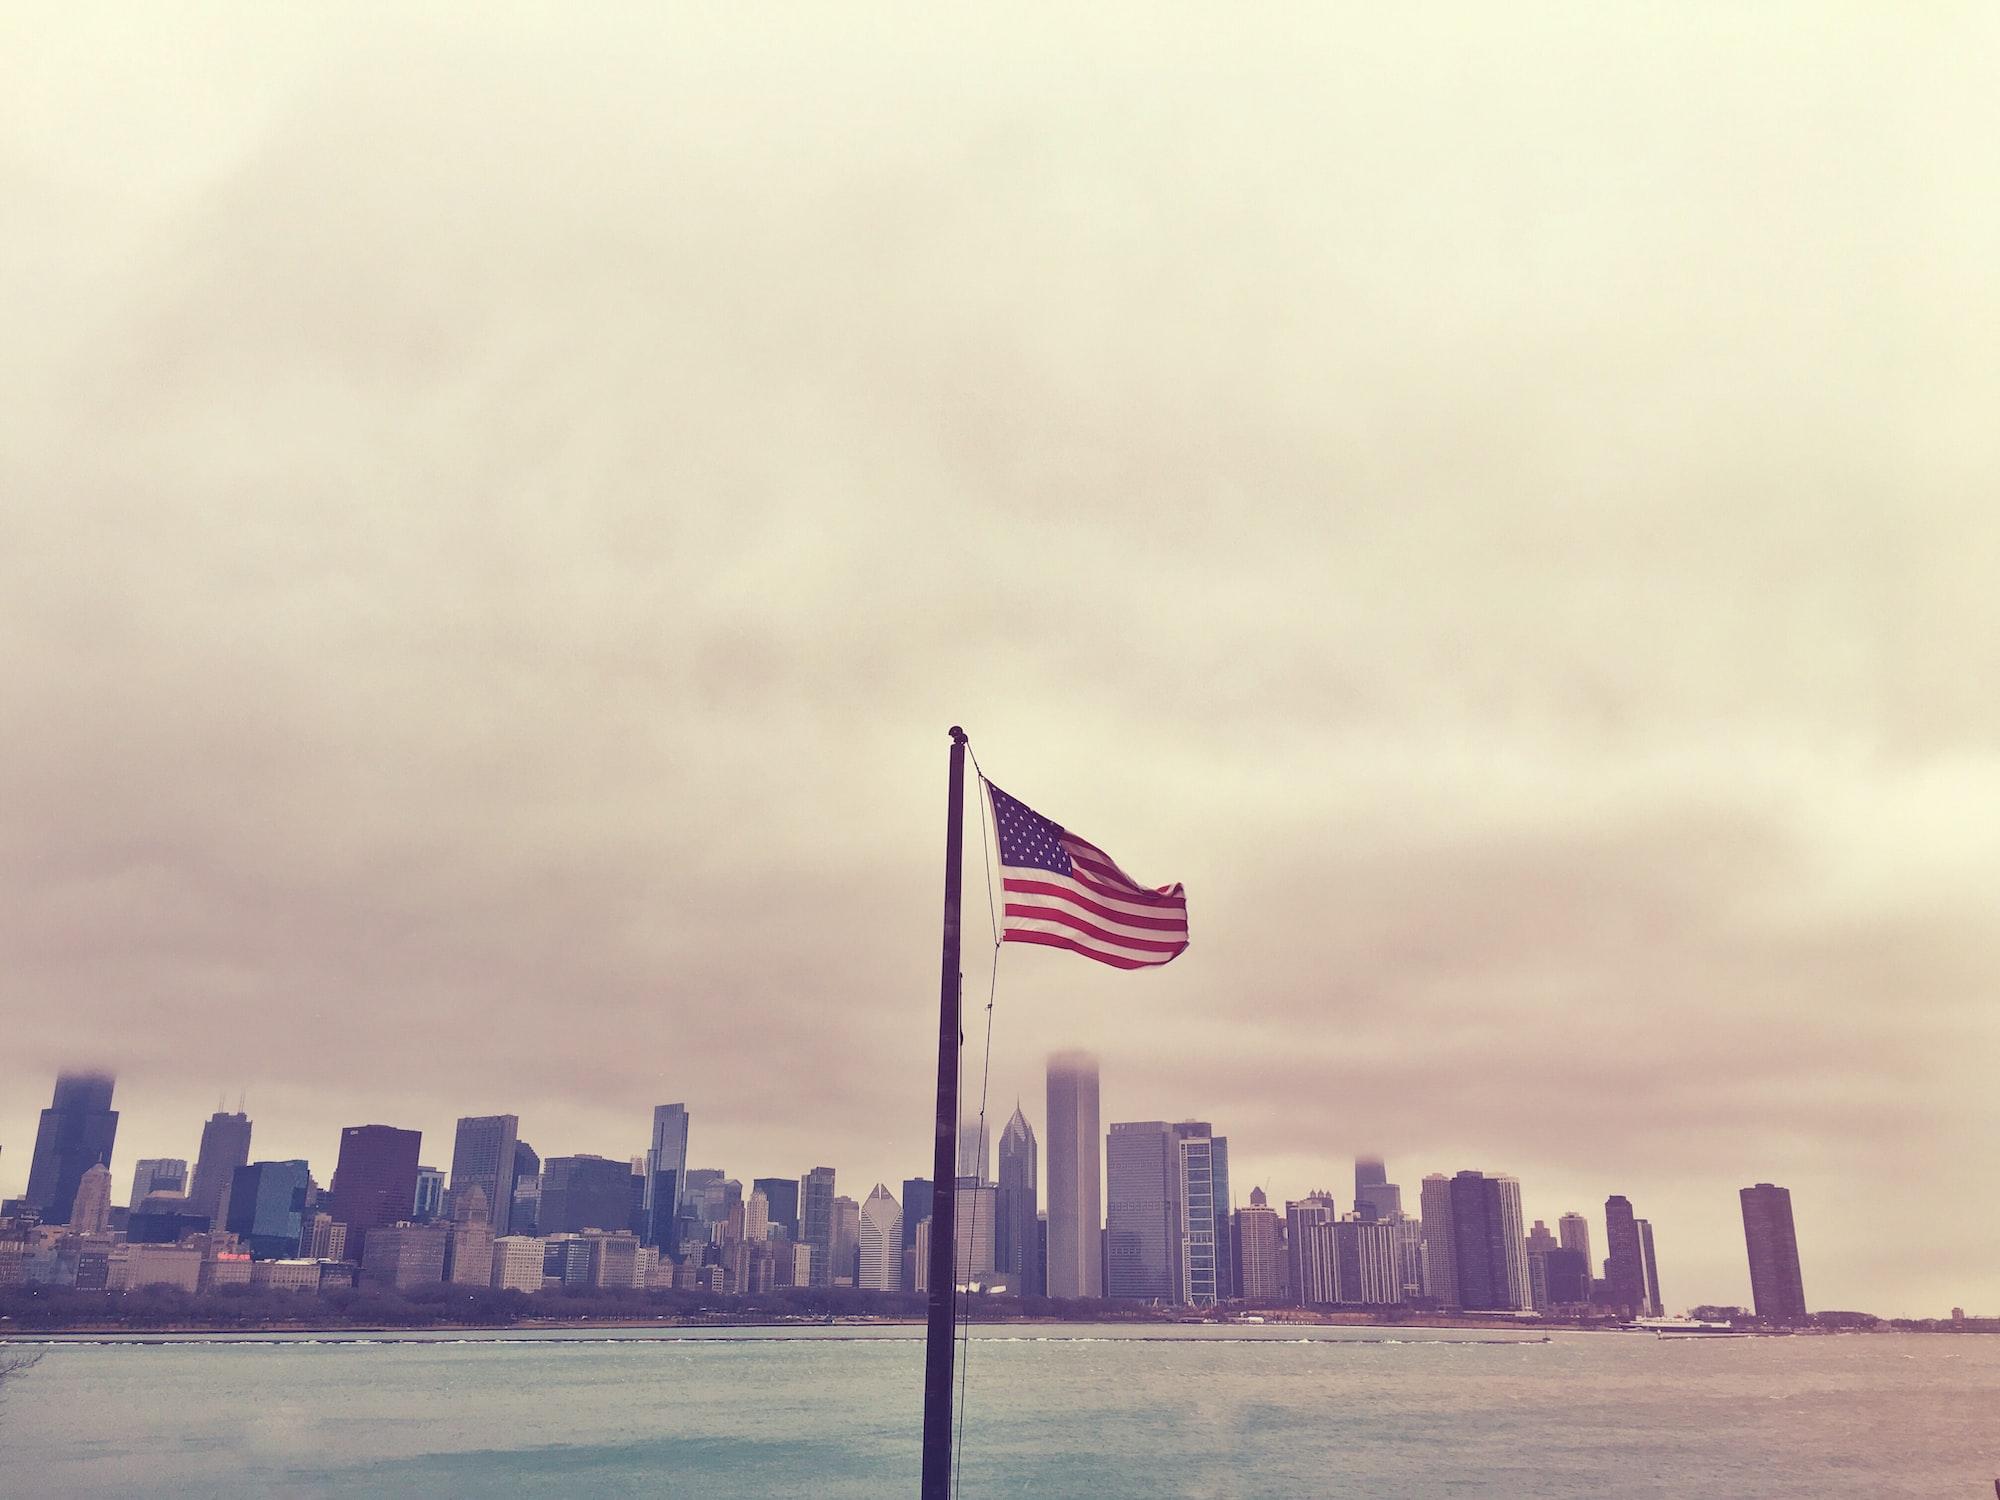 American flag & Chicago Skyline from Planetarium